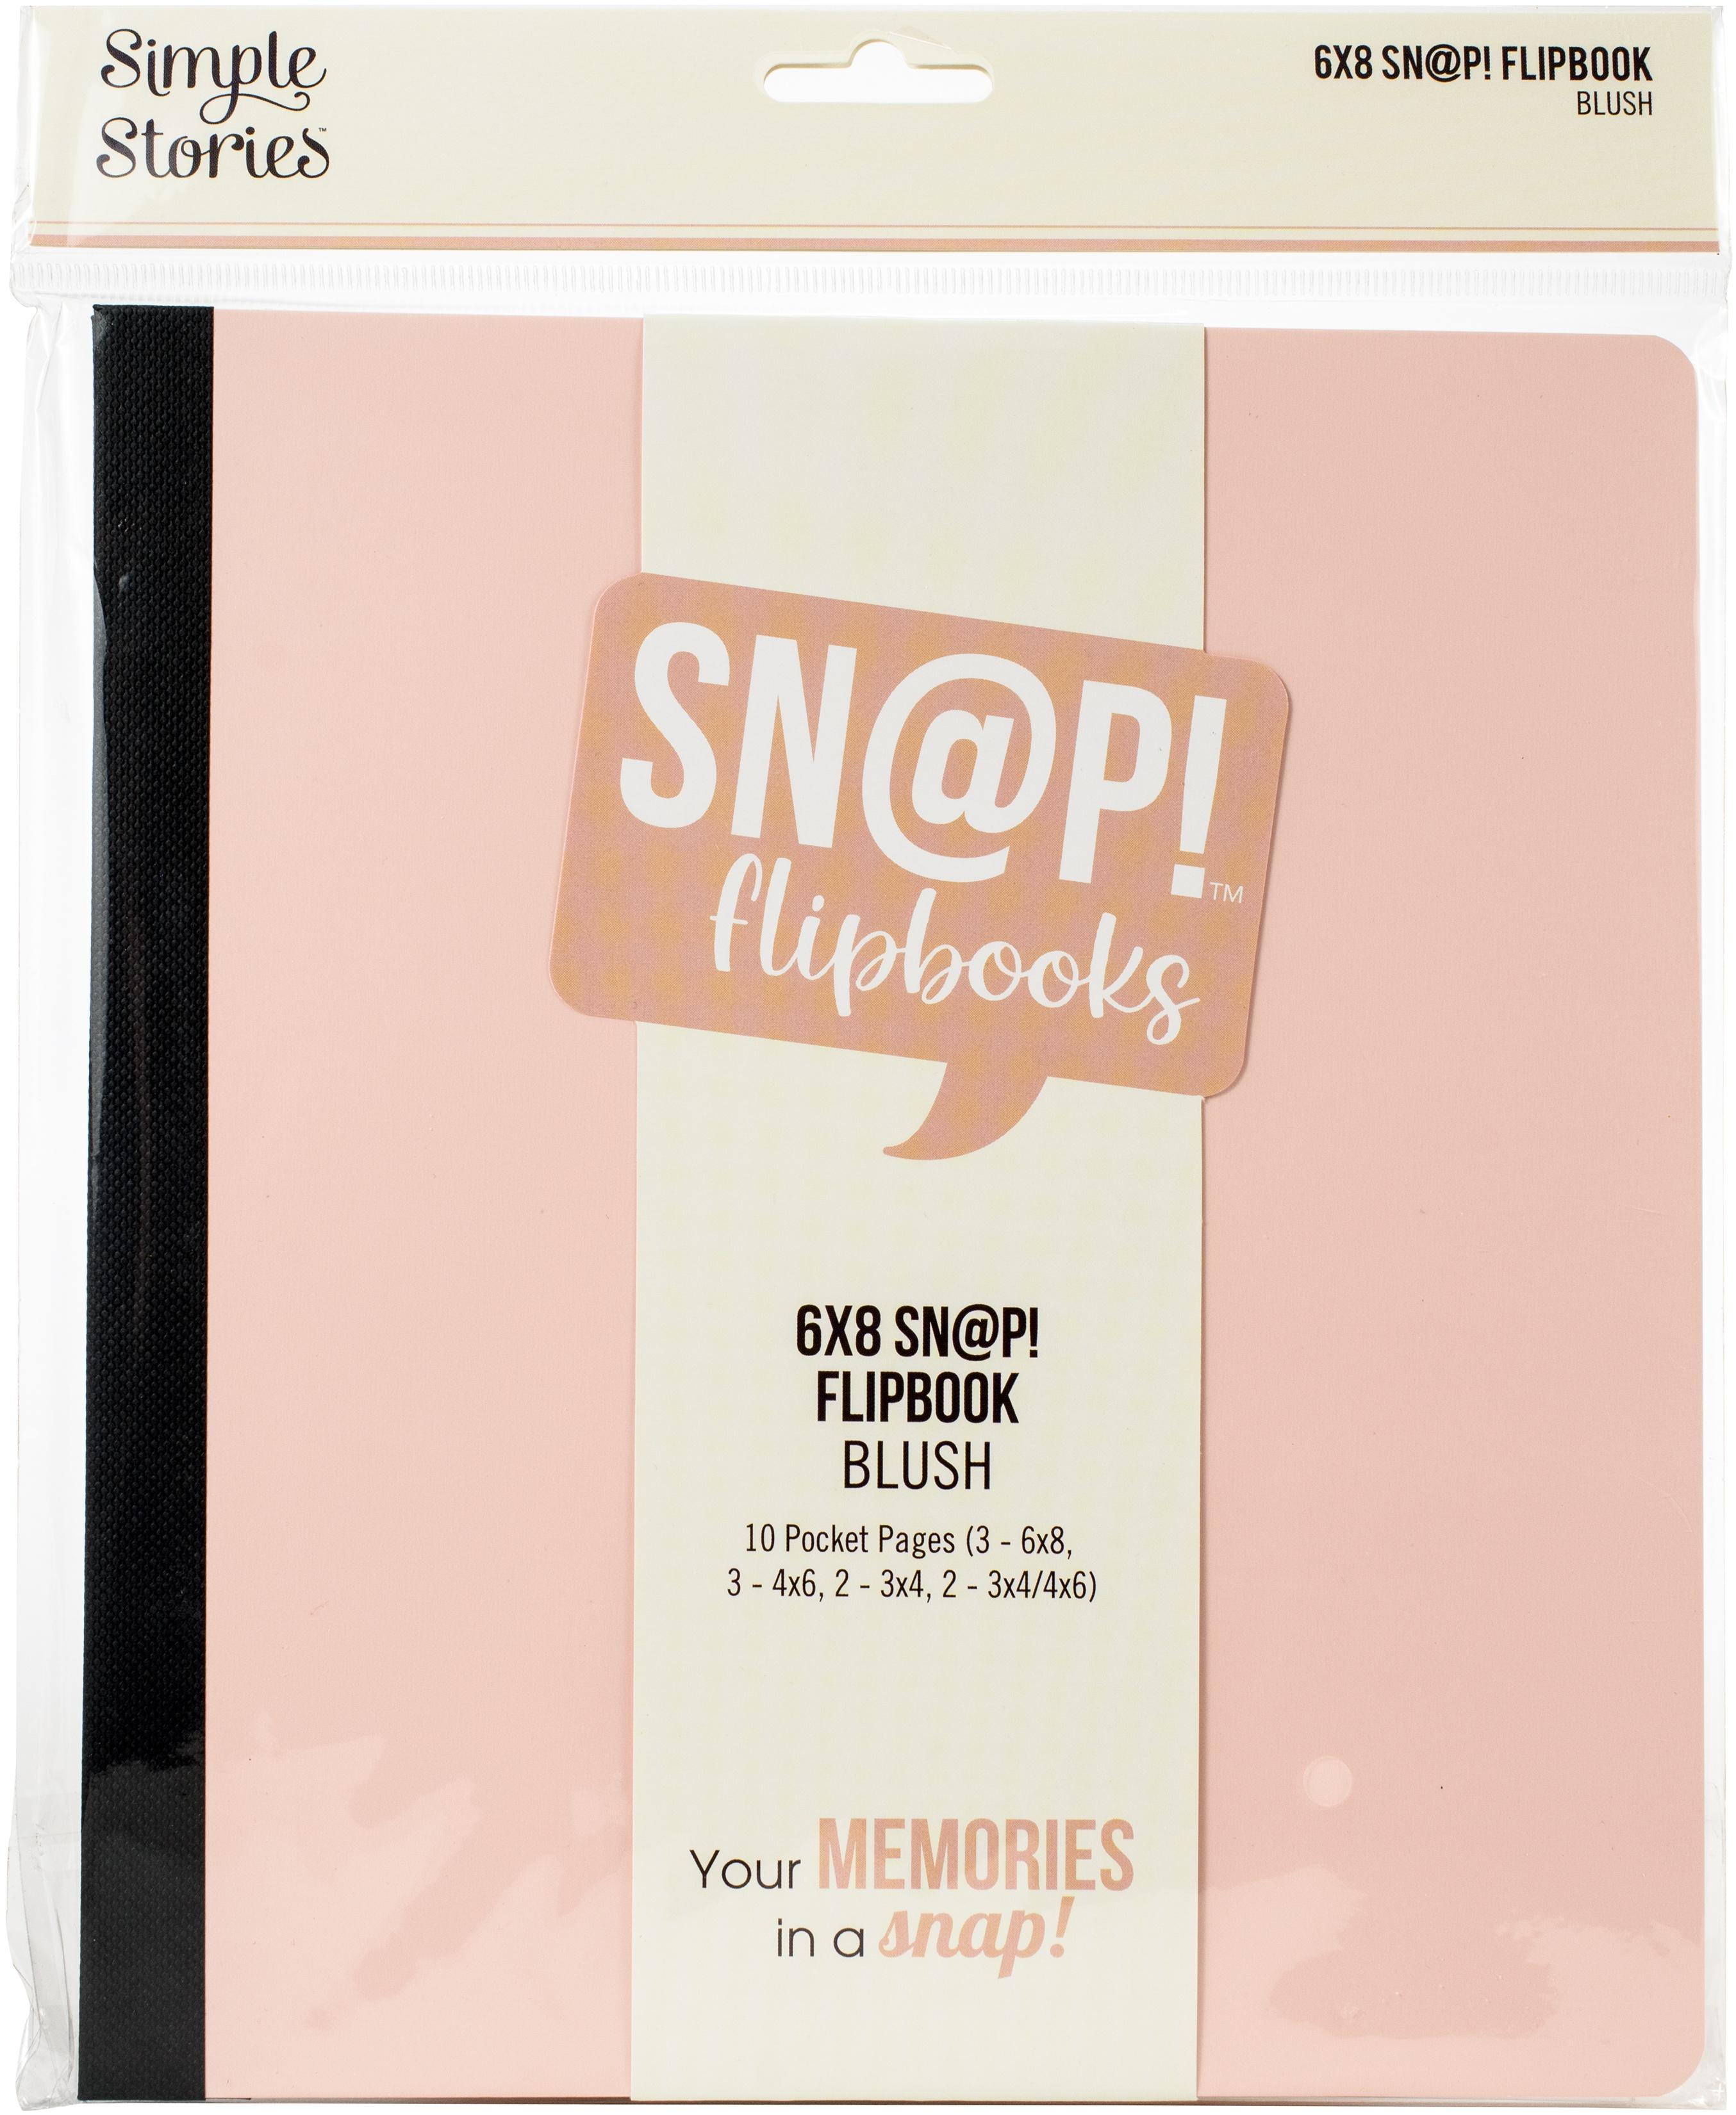 Sn@p! Flipbook 6X8 - Blush